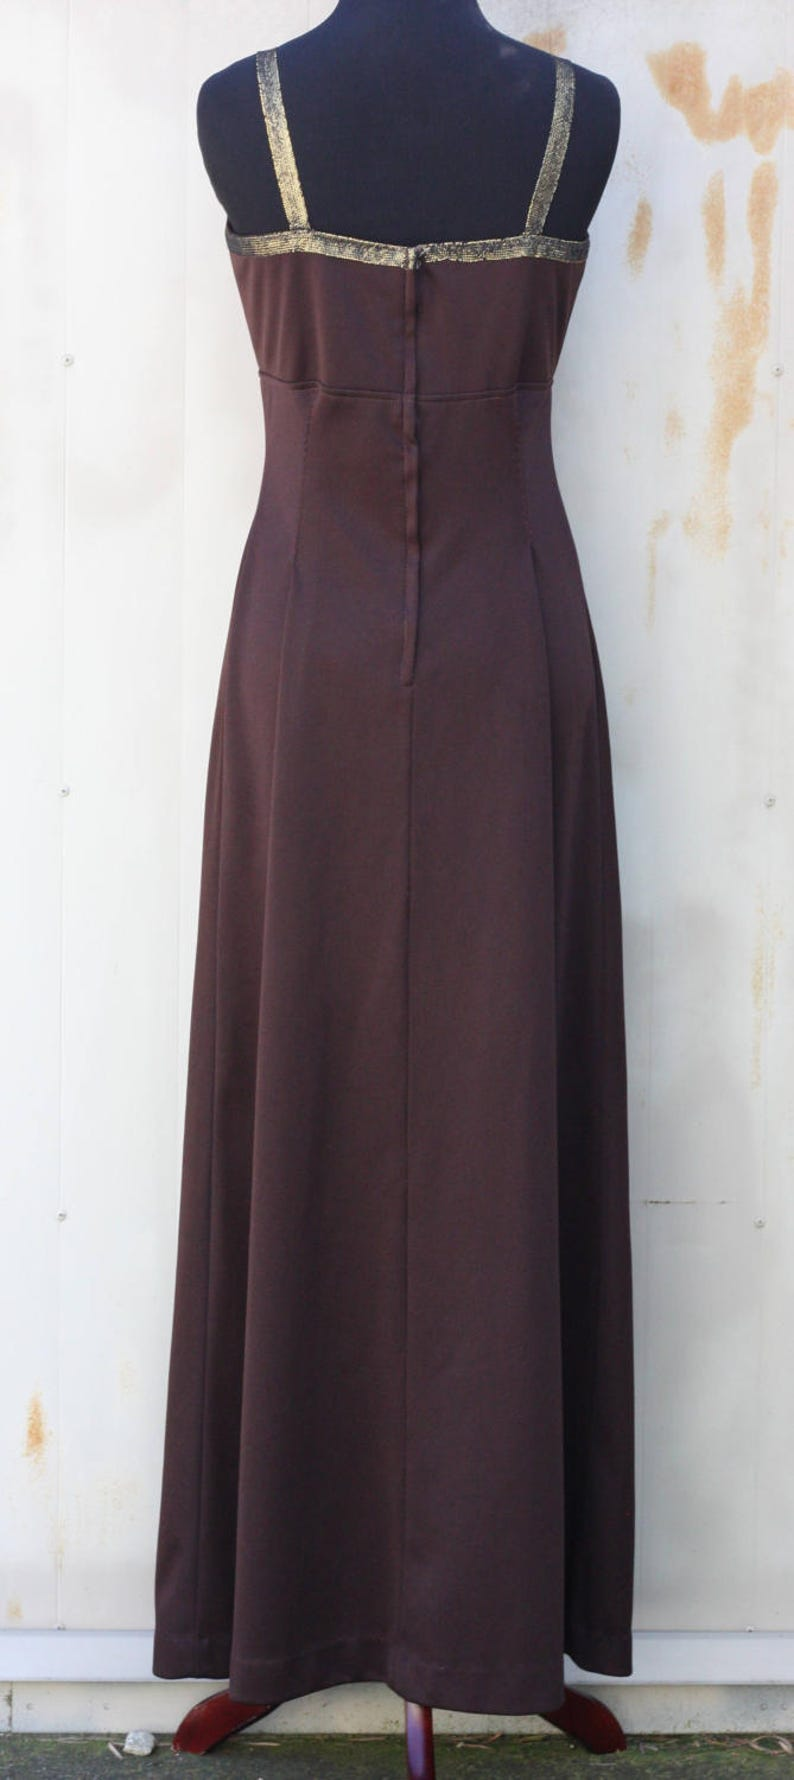 Floor Length Polyester Dress Boho Bohemian Dress Vintage Gown Simple 1970s Dress Hippie Dress Indie Dress 70s Brown Maxi Dress